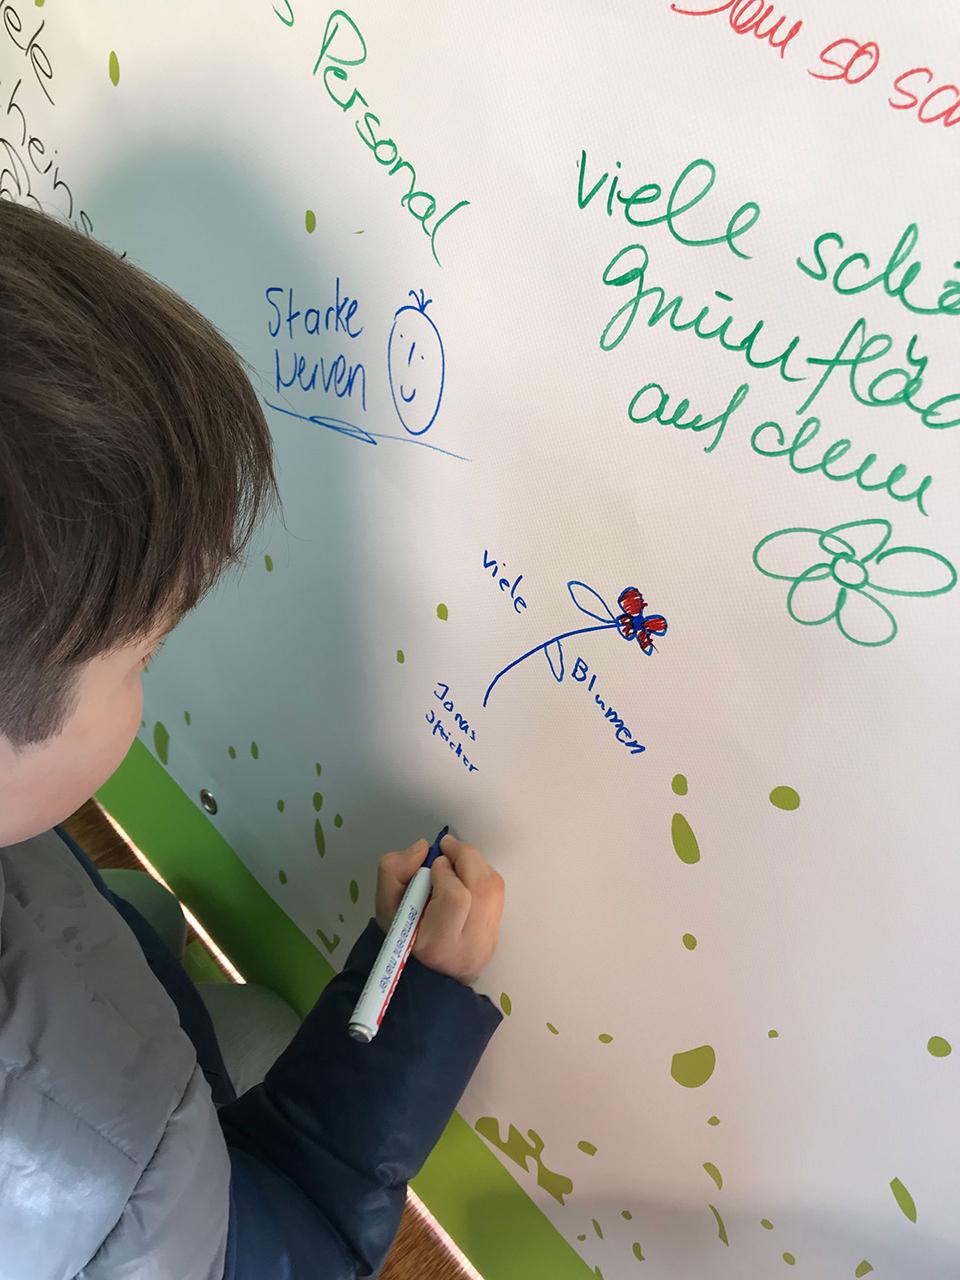 KSSG_Bau-Info_Woche_2018_007.JPG